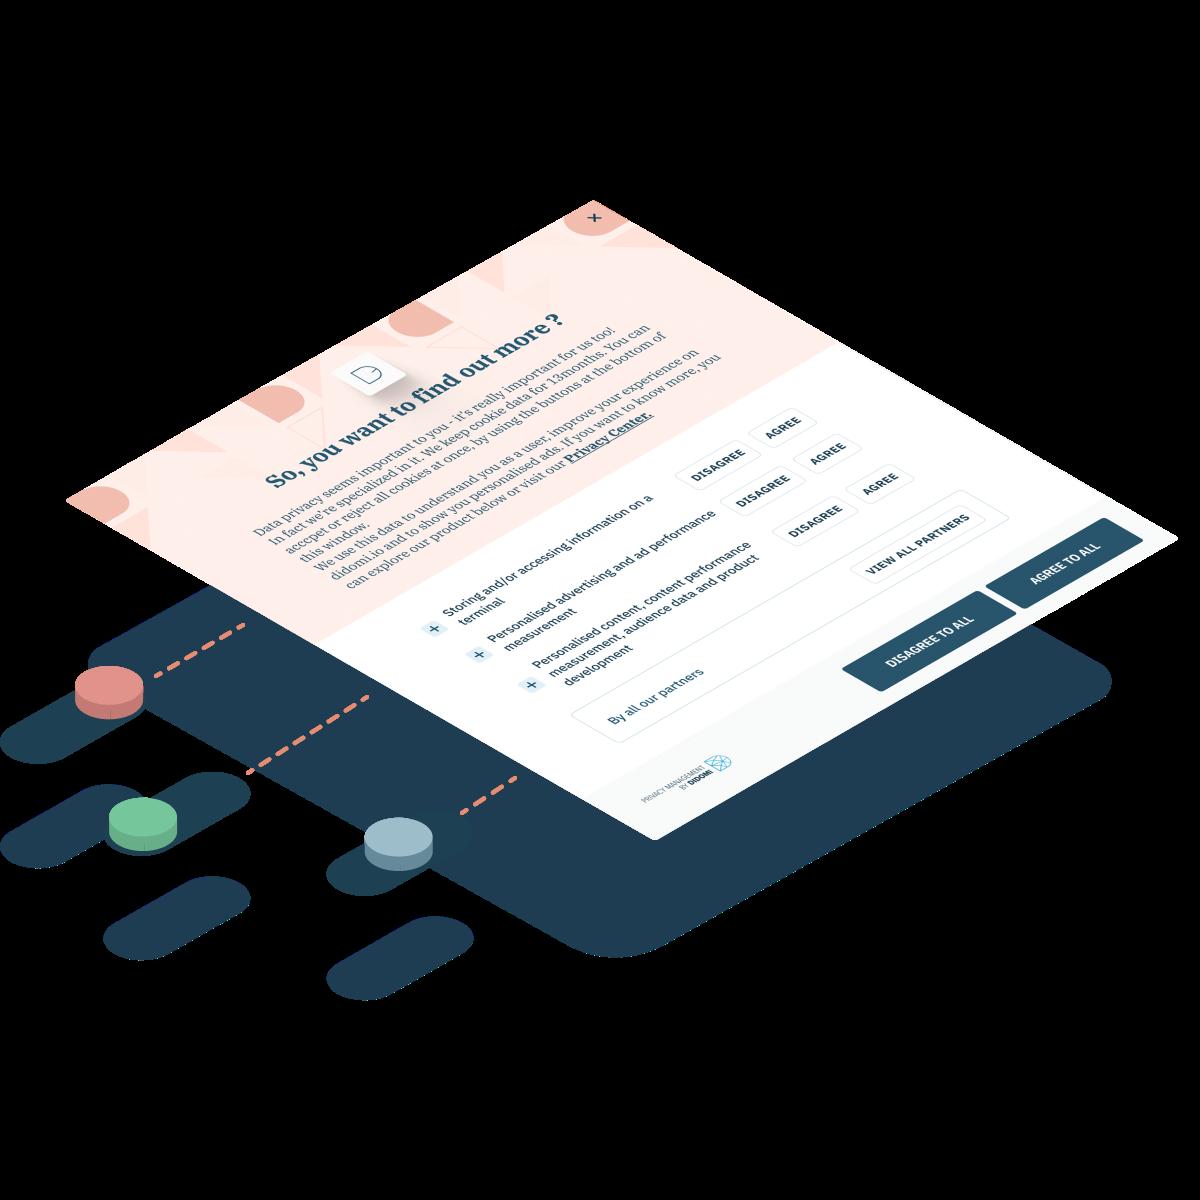 Illustration of the Didomi Consent Management Platform